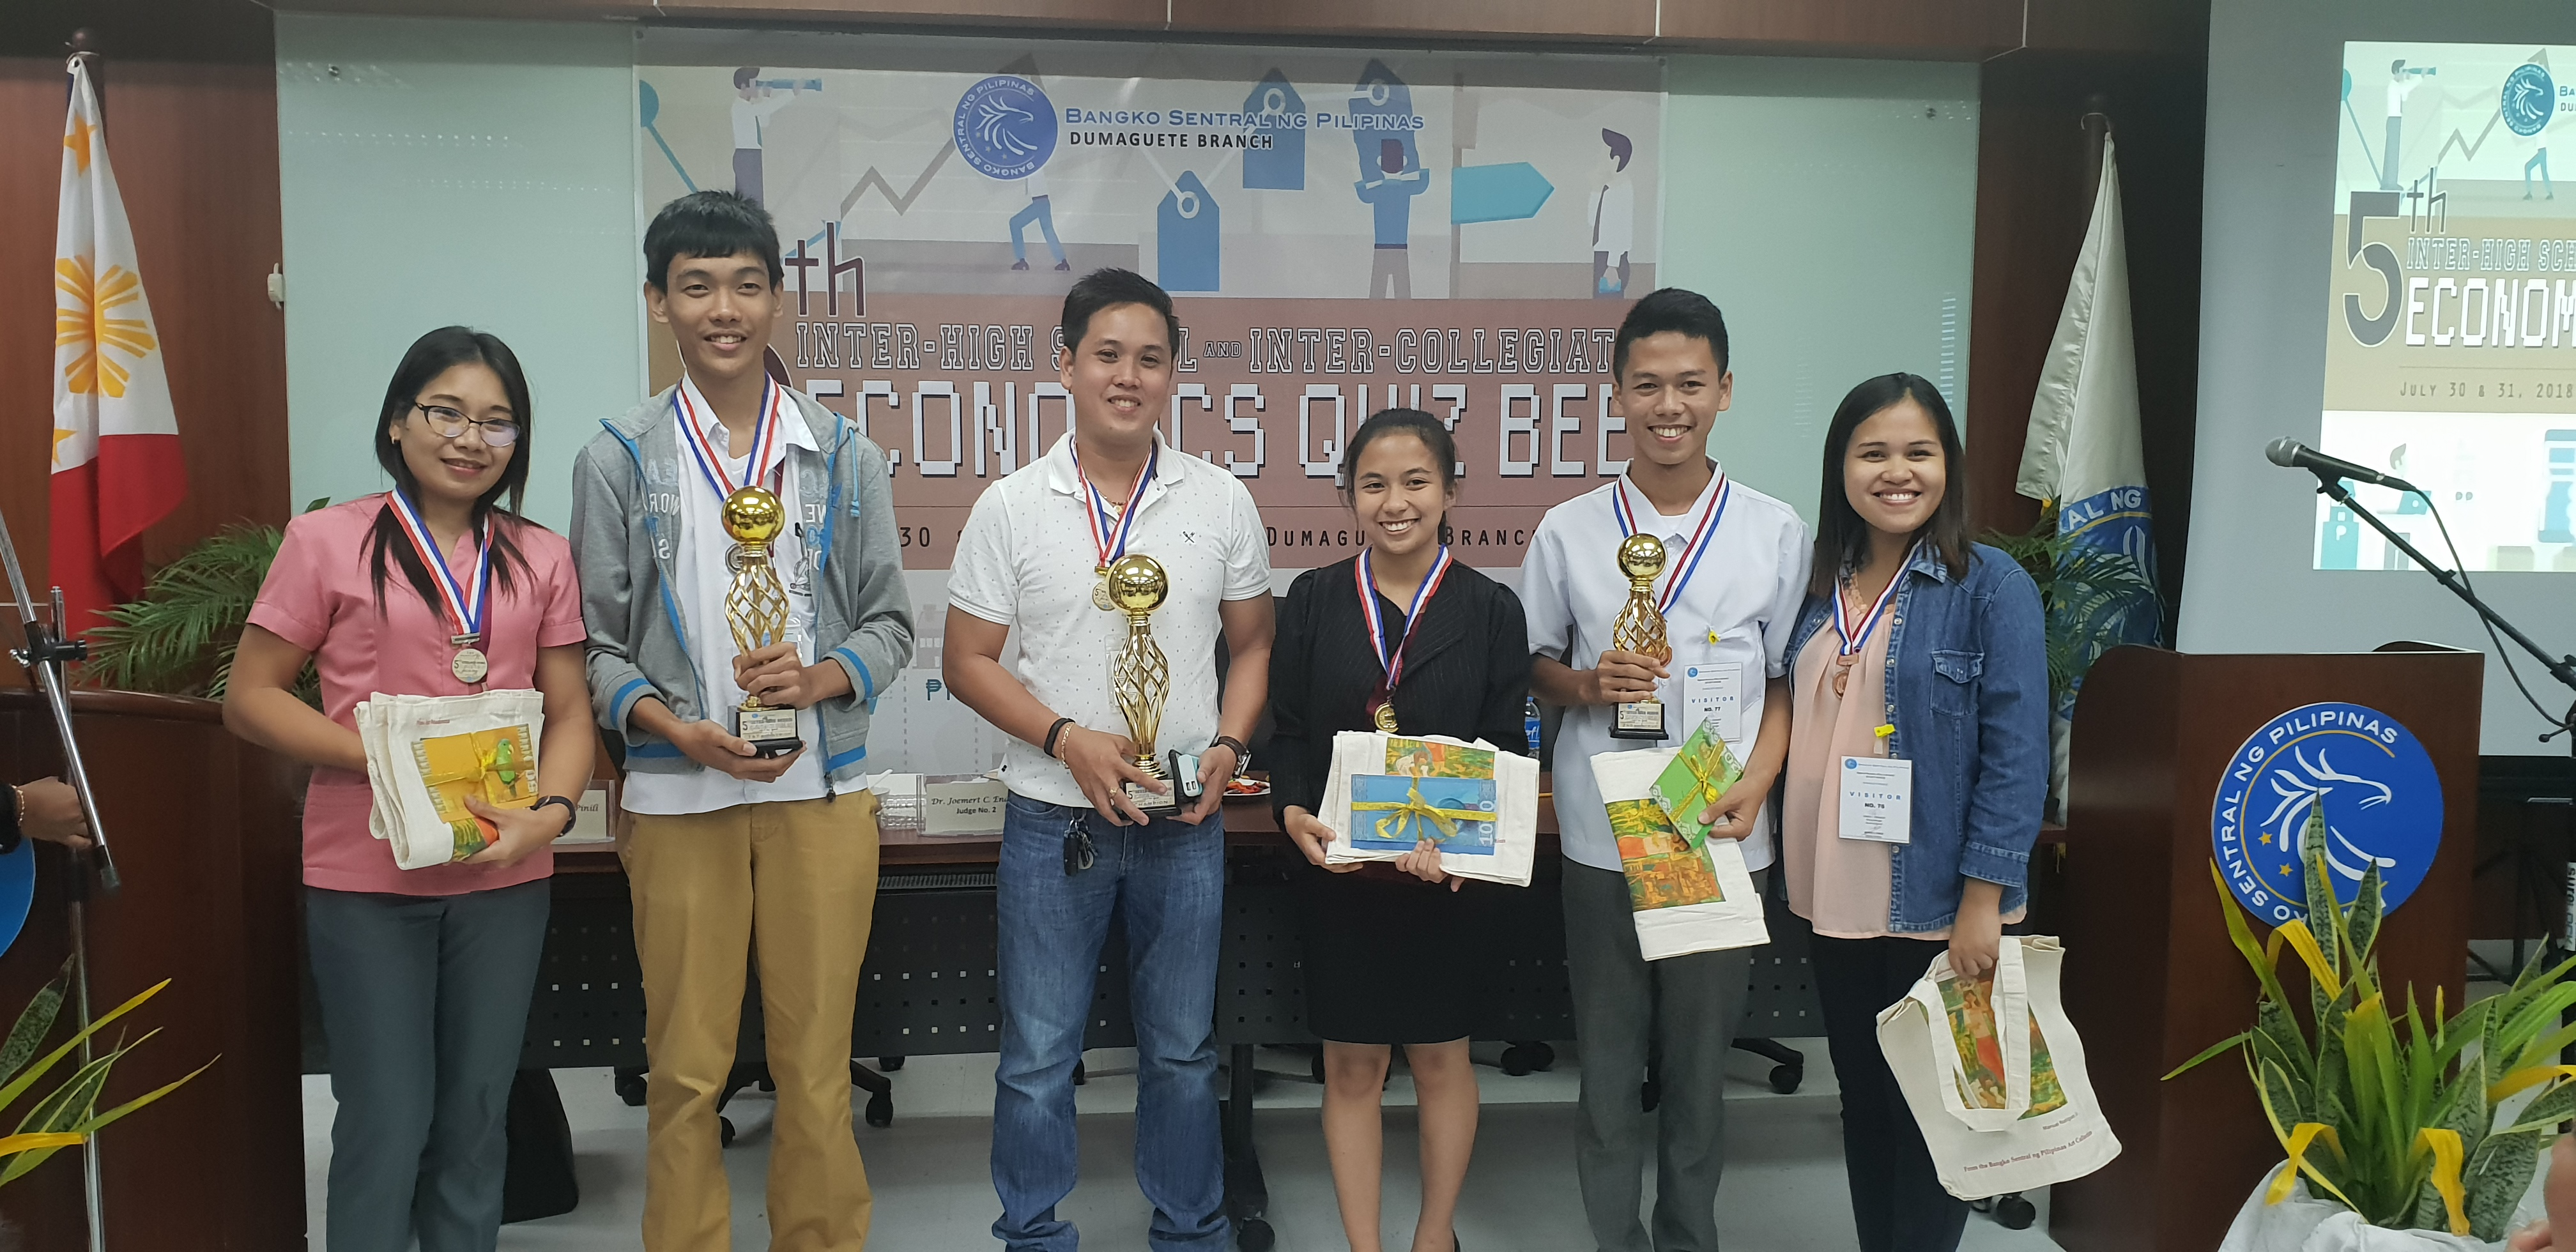 Grade 12 ABM Major is Central Bank Economics Quiz champion